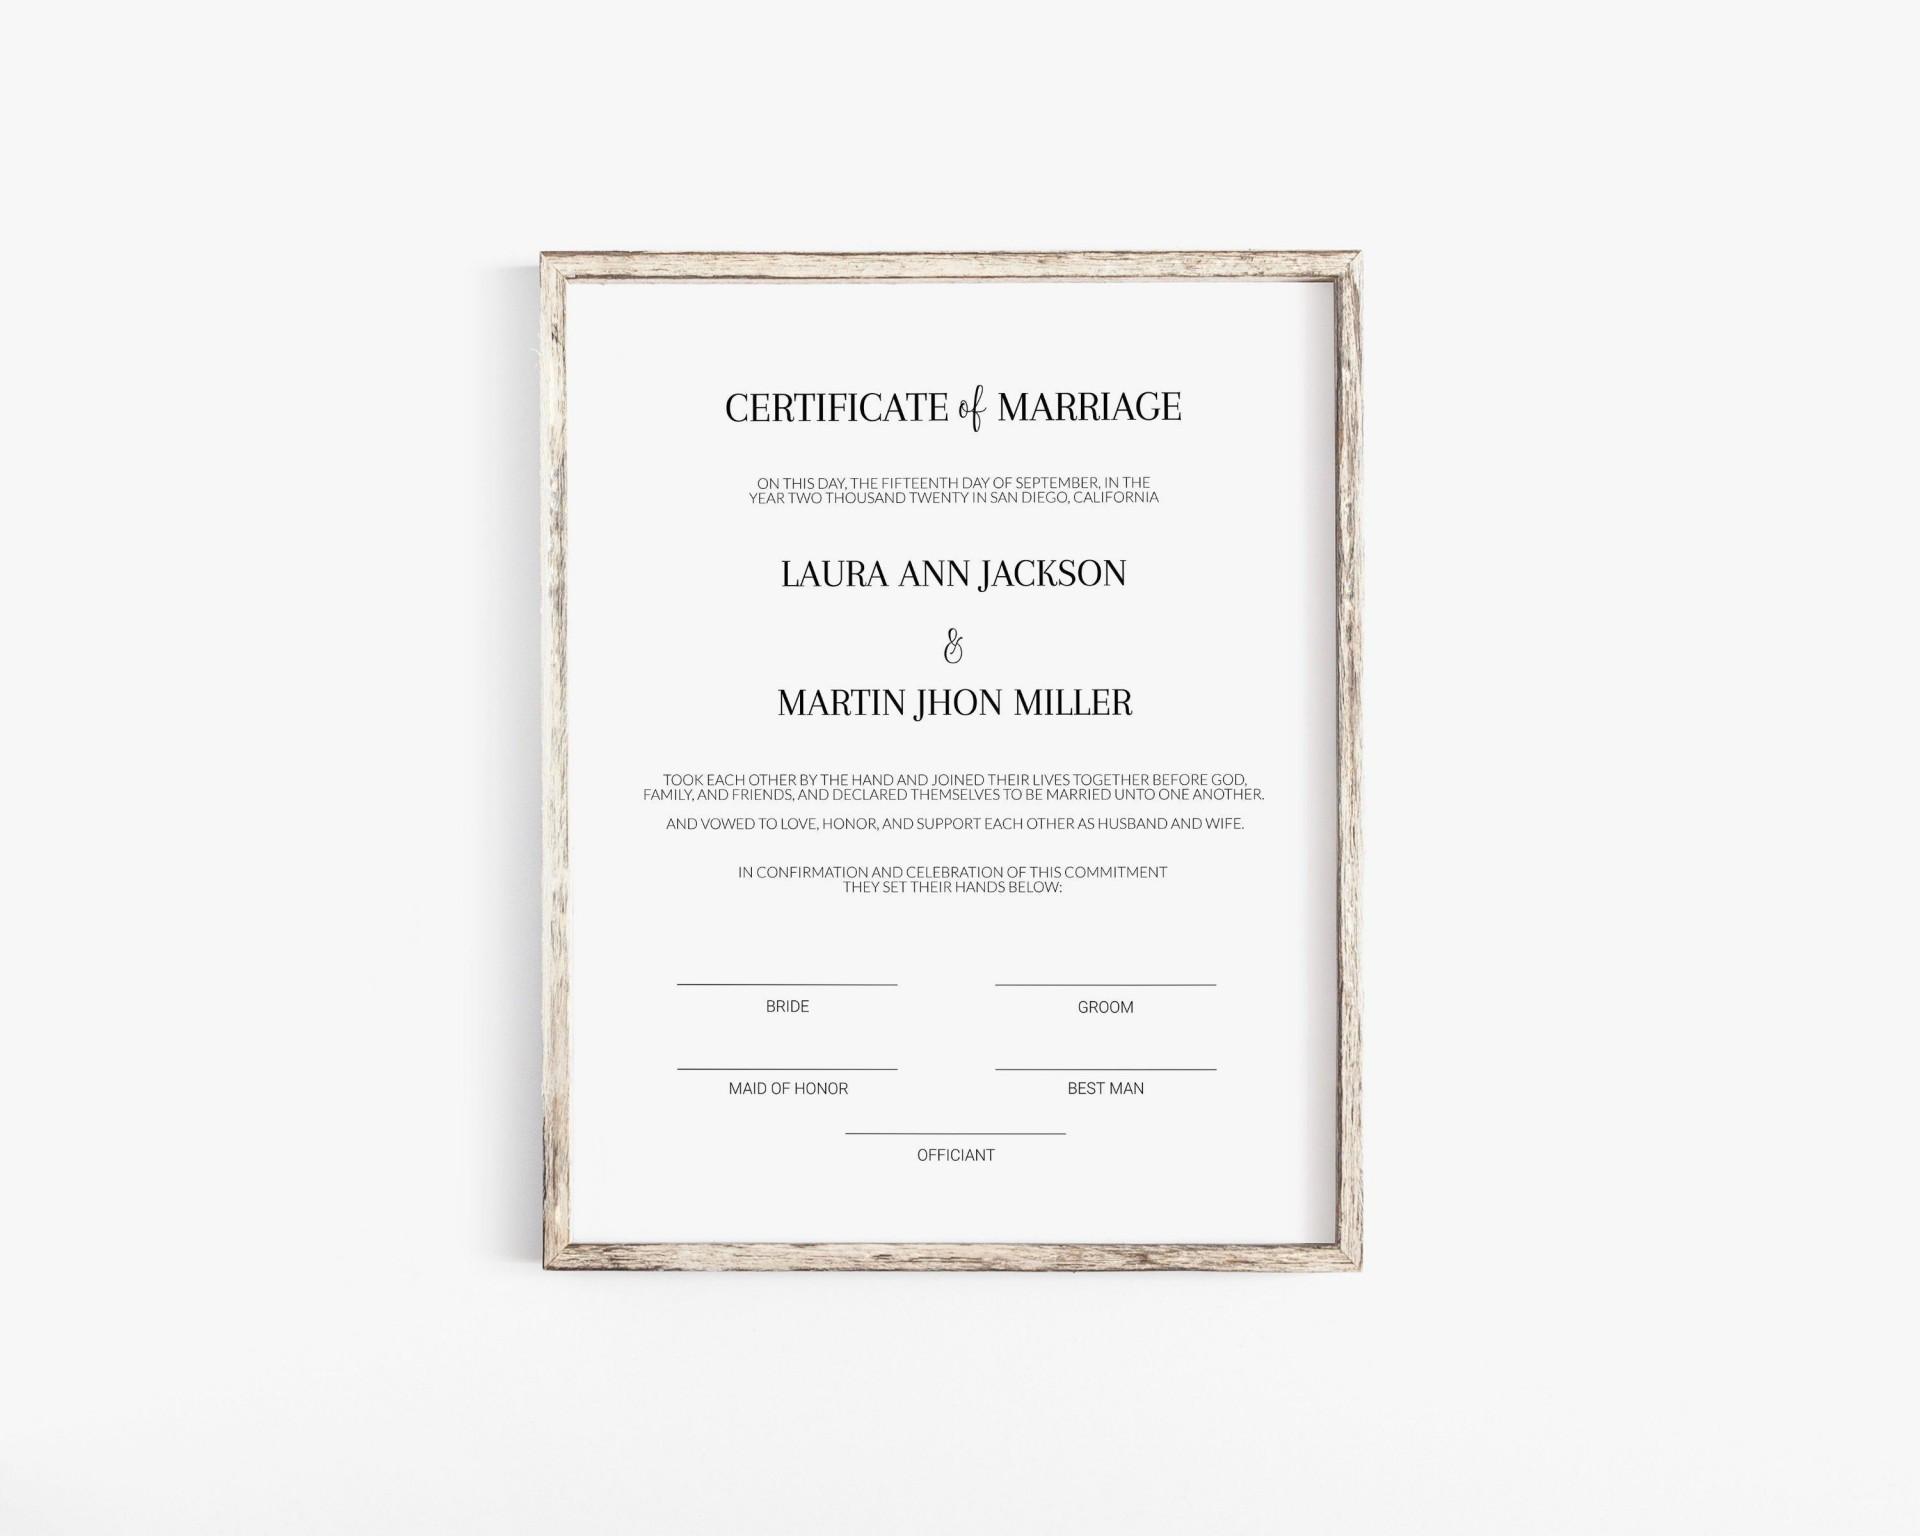 003 Singular Free Marriage Certificate Template Sample  Fillable Wedding Download Renewal1920